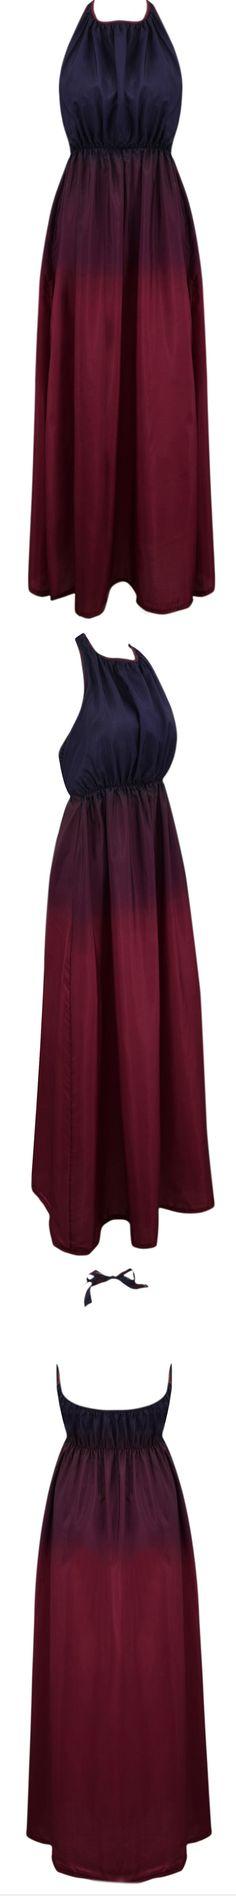 Gradient Ramp High Slit Pleated Maxi Halter Dress